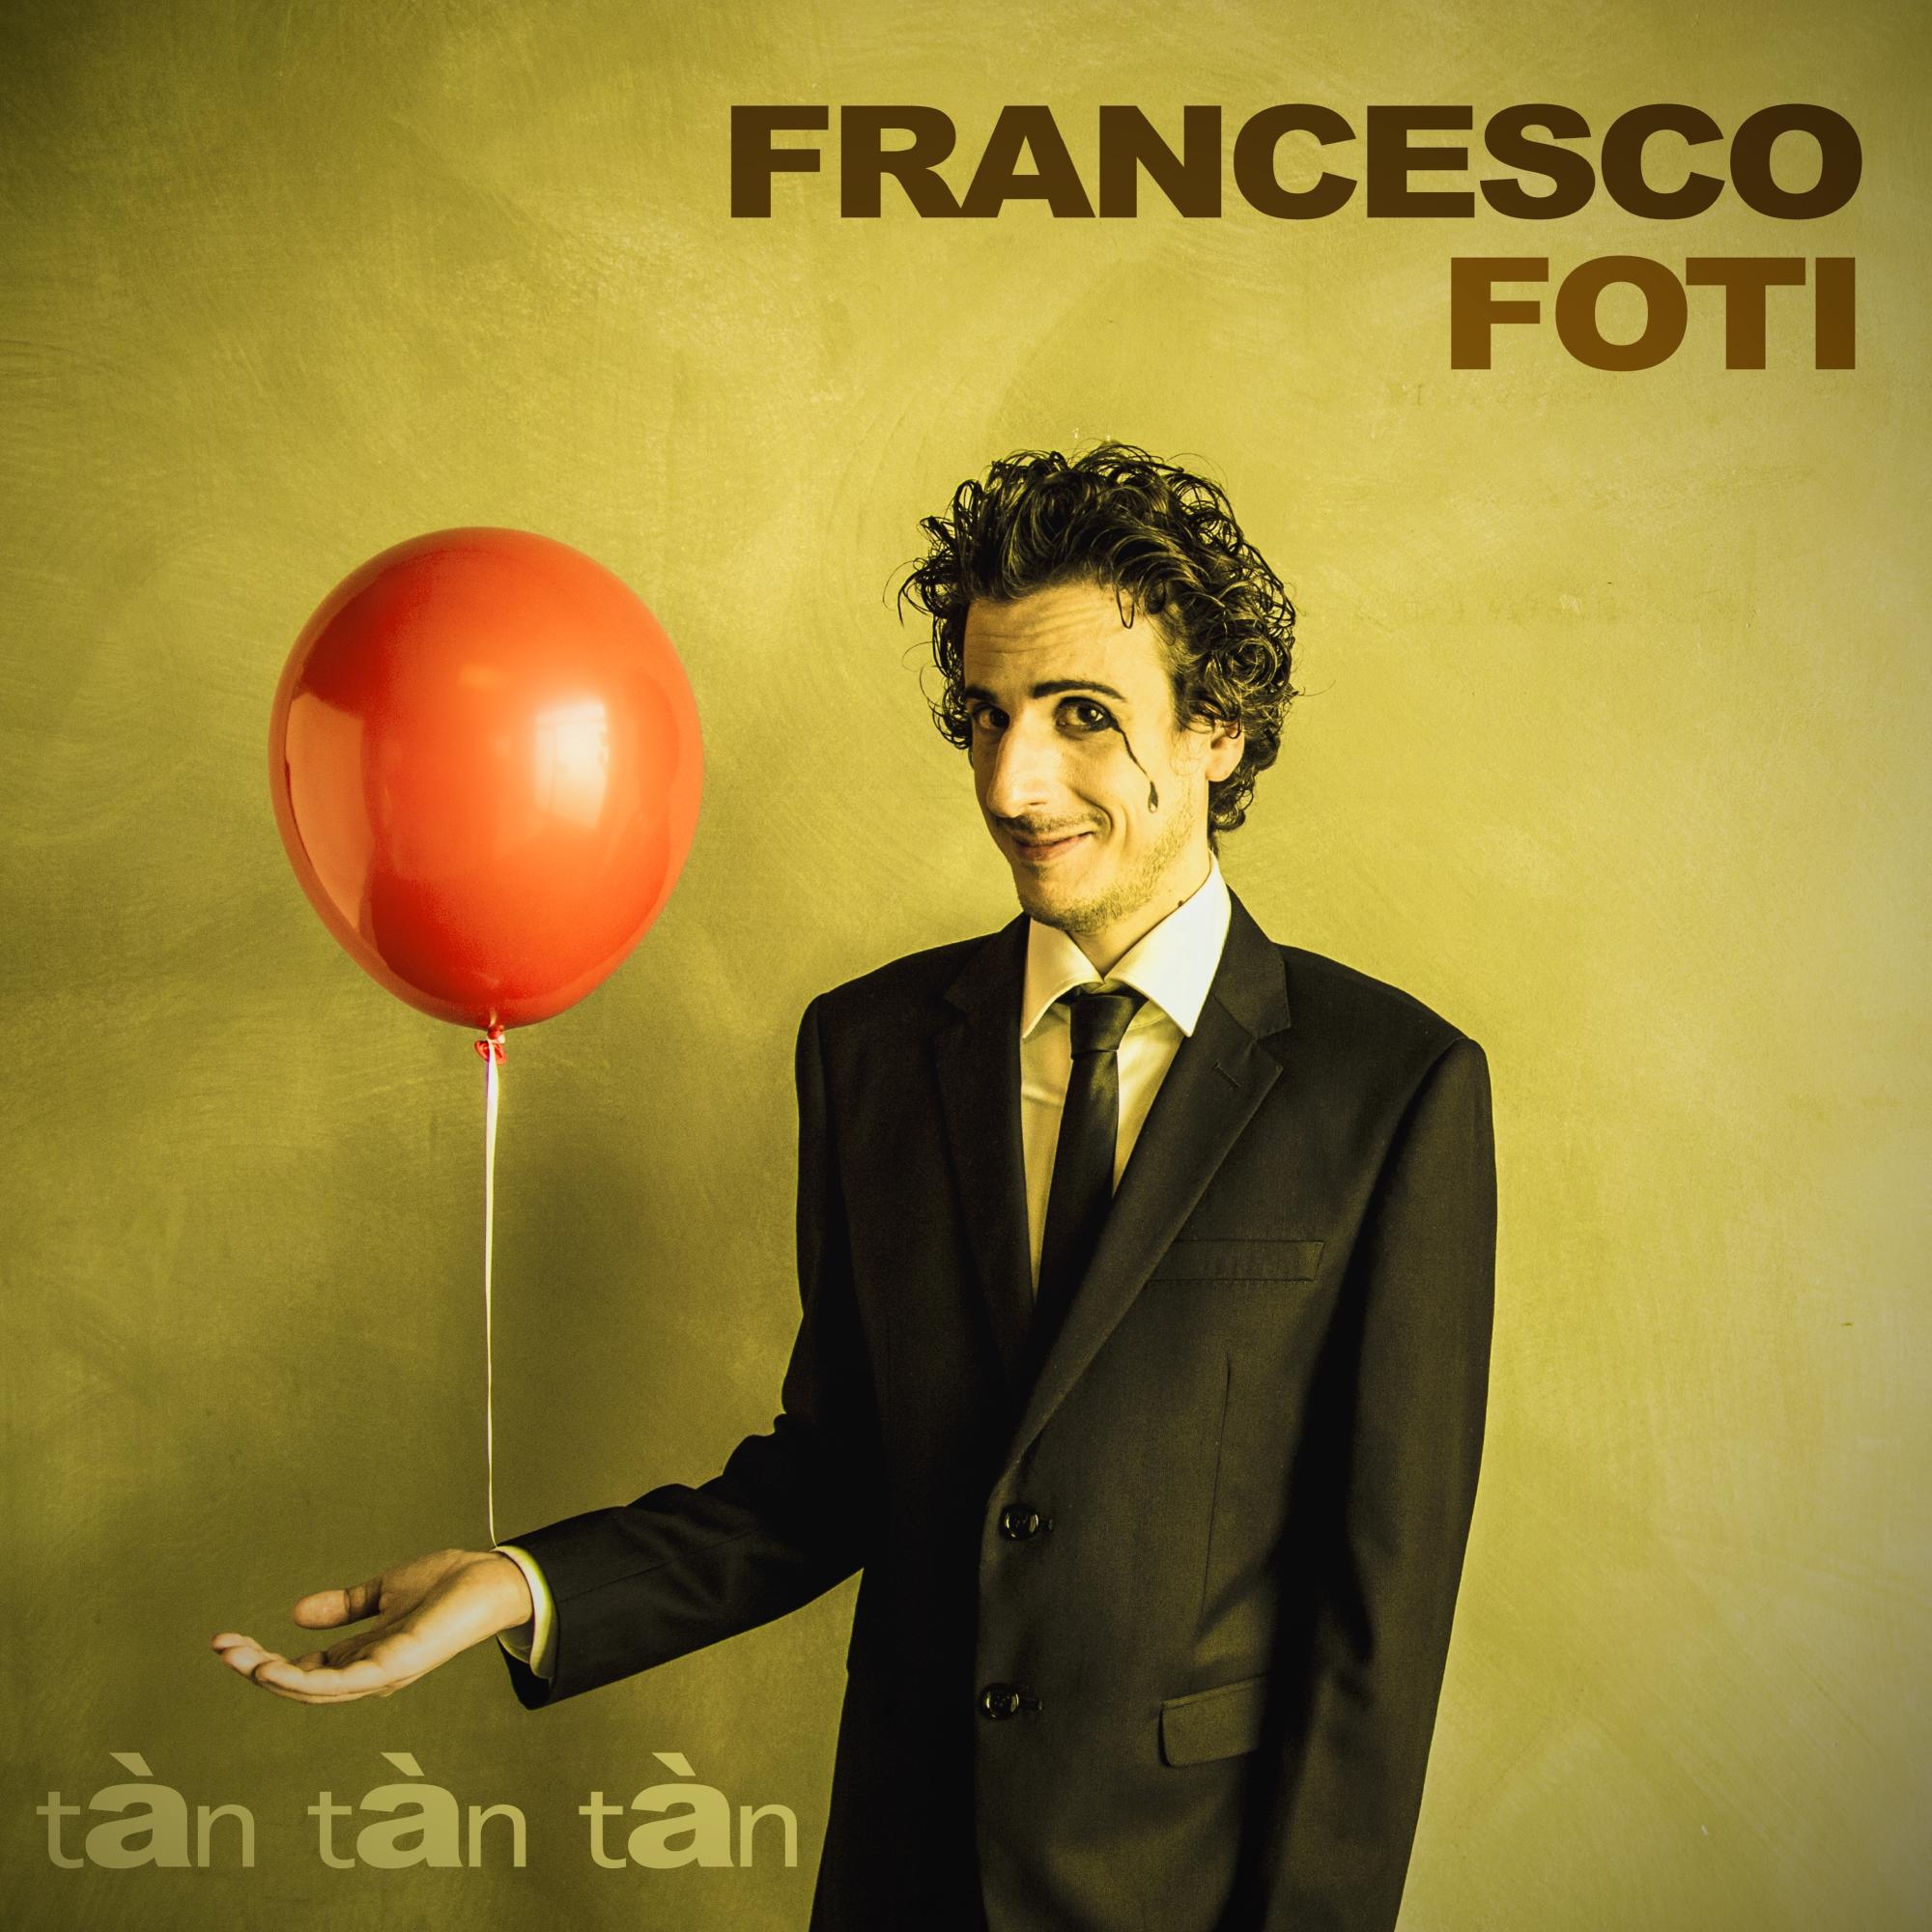 Francesco Foti - Copertina Tàn Tàn Tàn.jpg